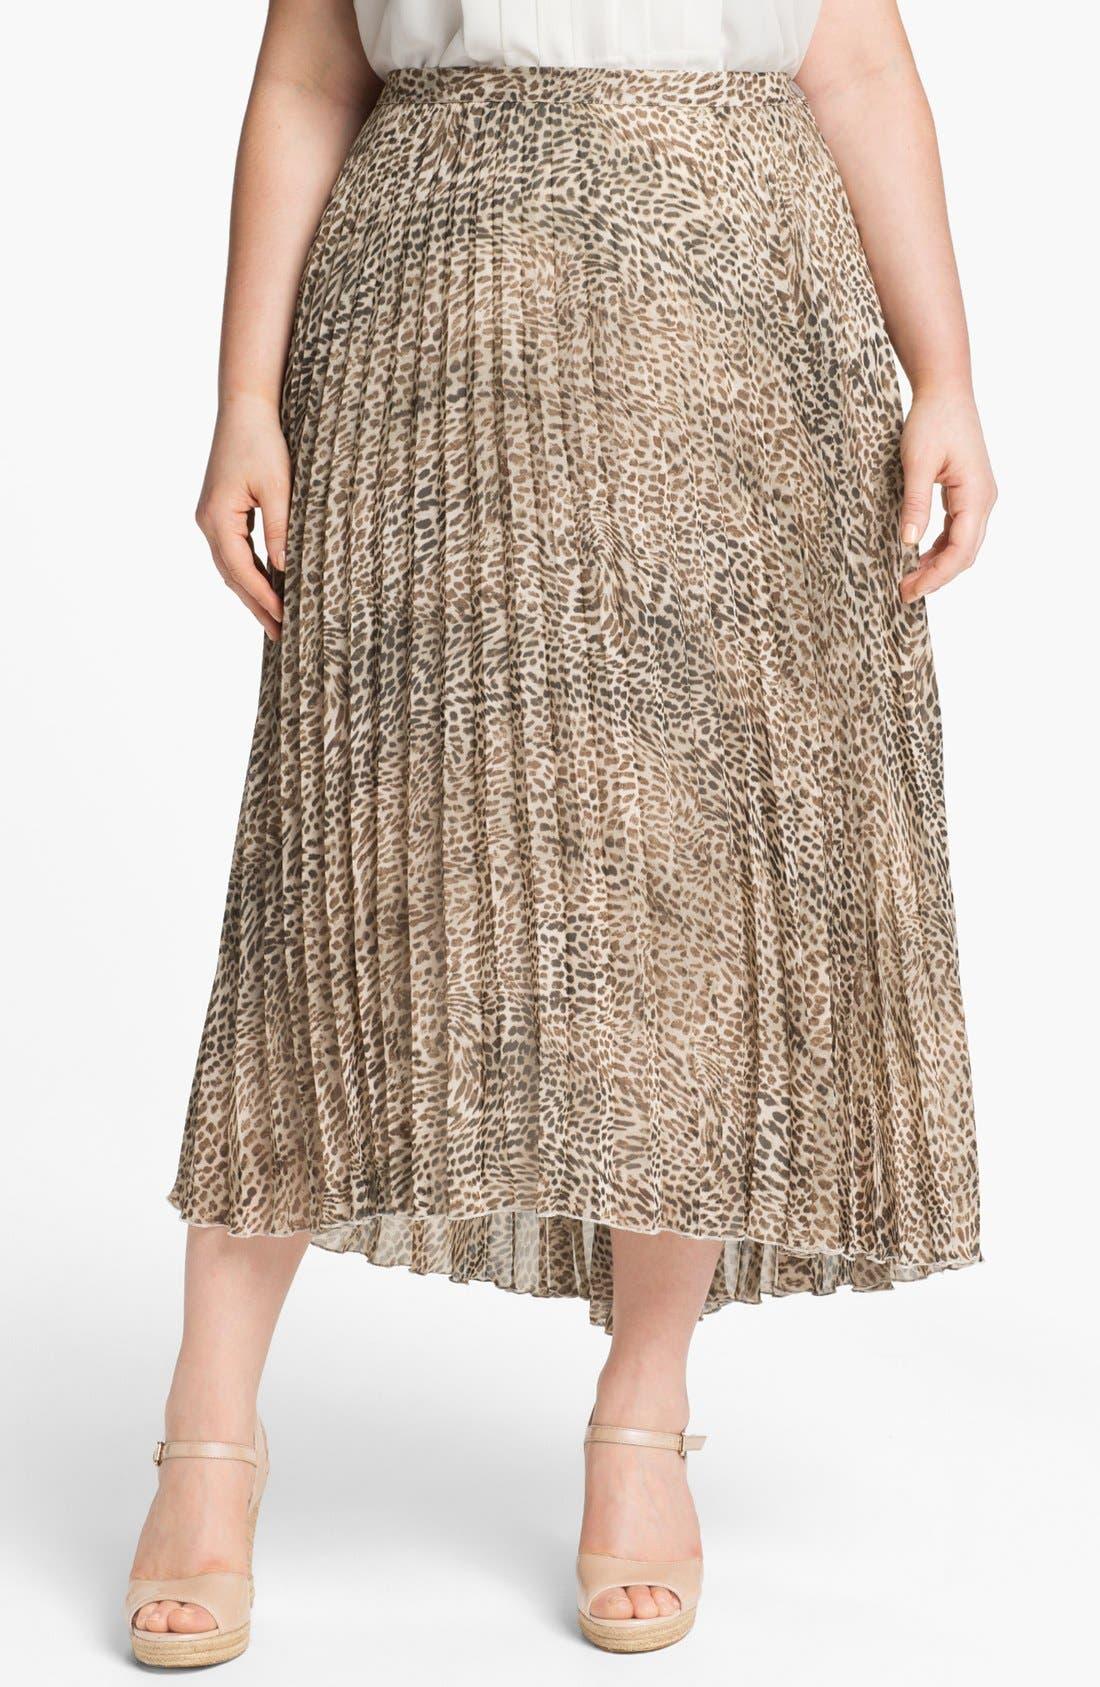 Alternate Image 1 Selected - Vince Camuto Cheetah Print Chiffon Skirt (Plus Size)